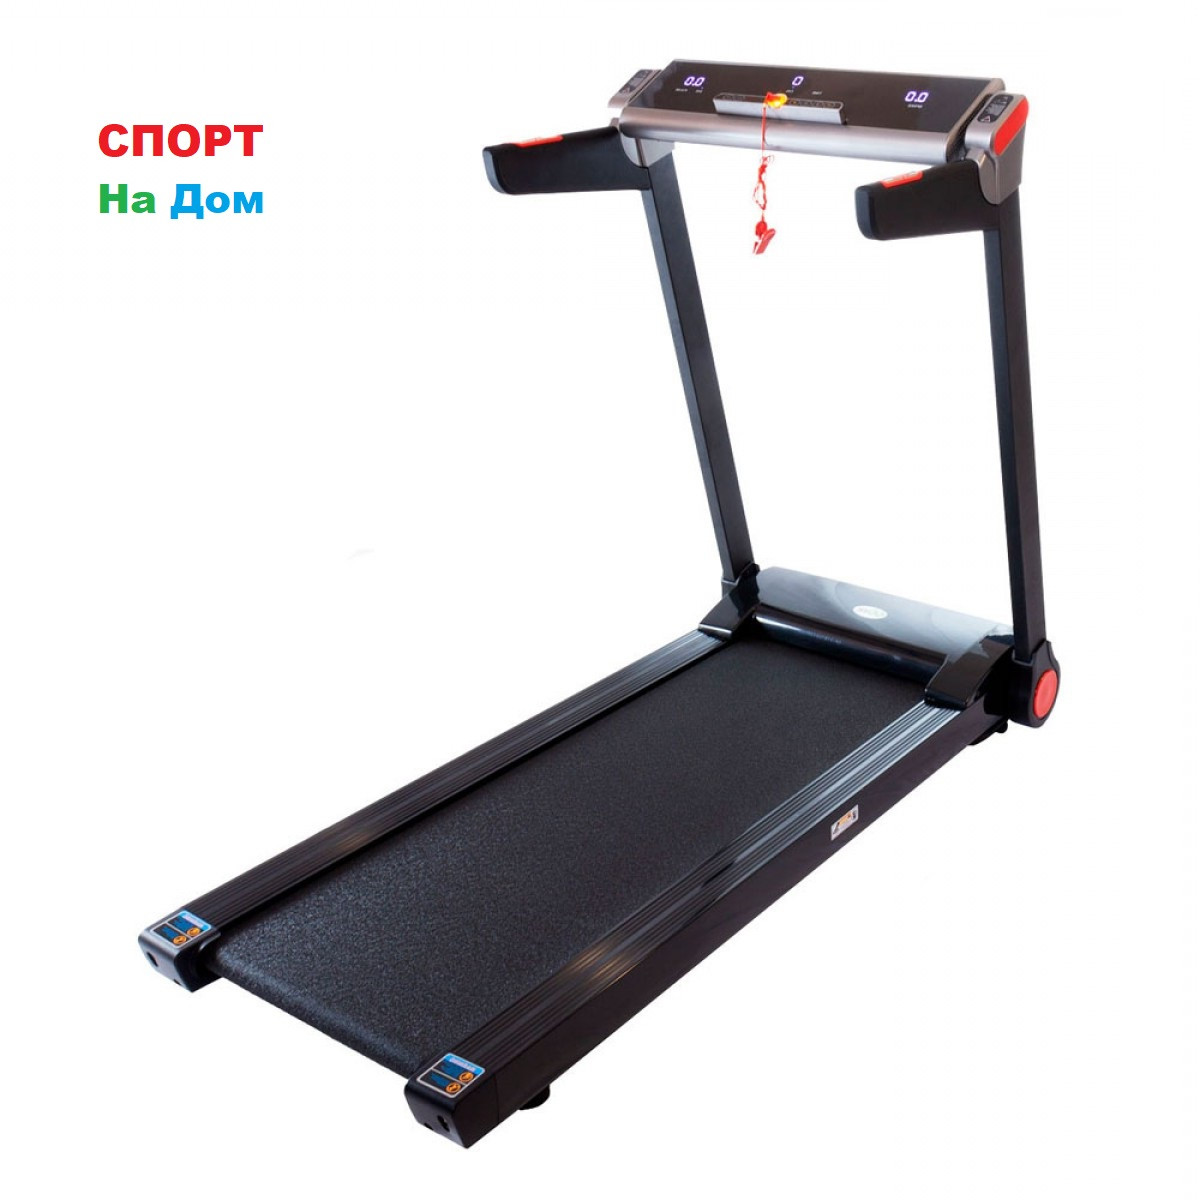 Беговая дорожка HV 242 G до 100 кг